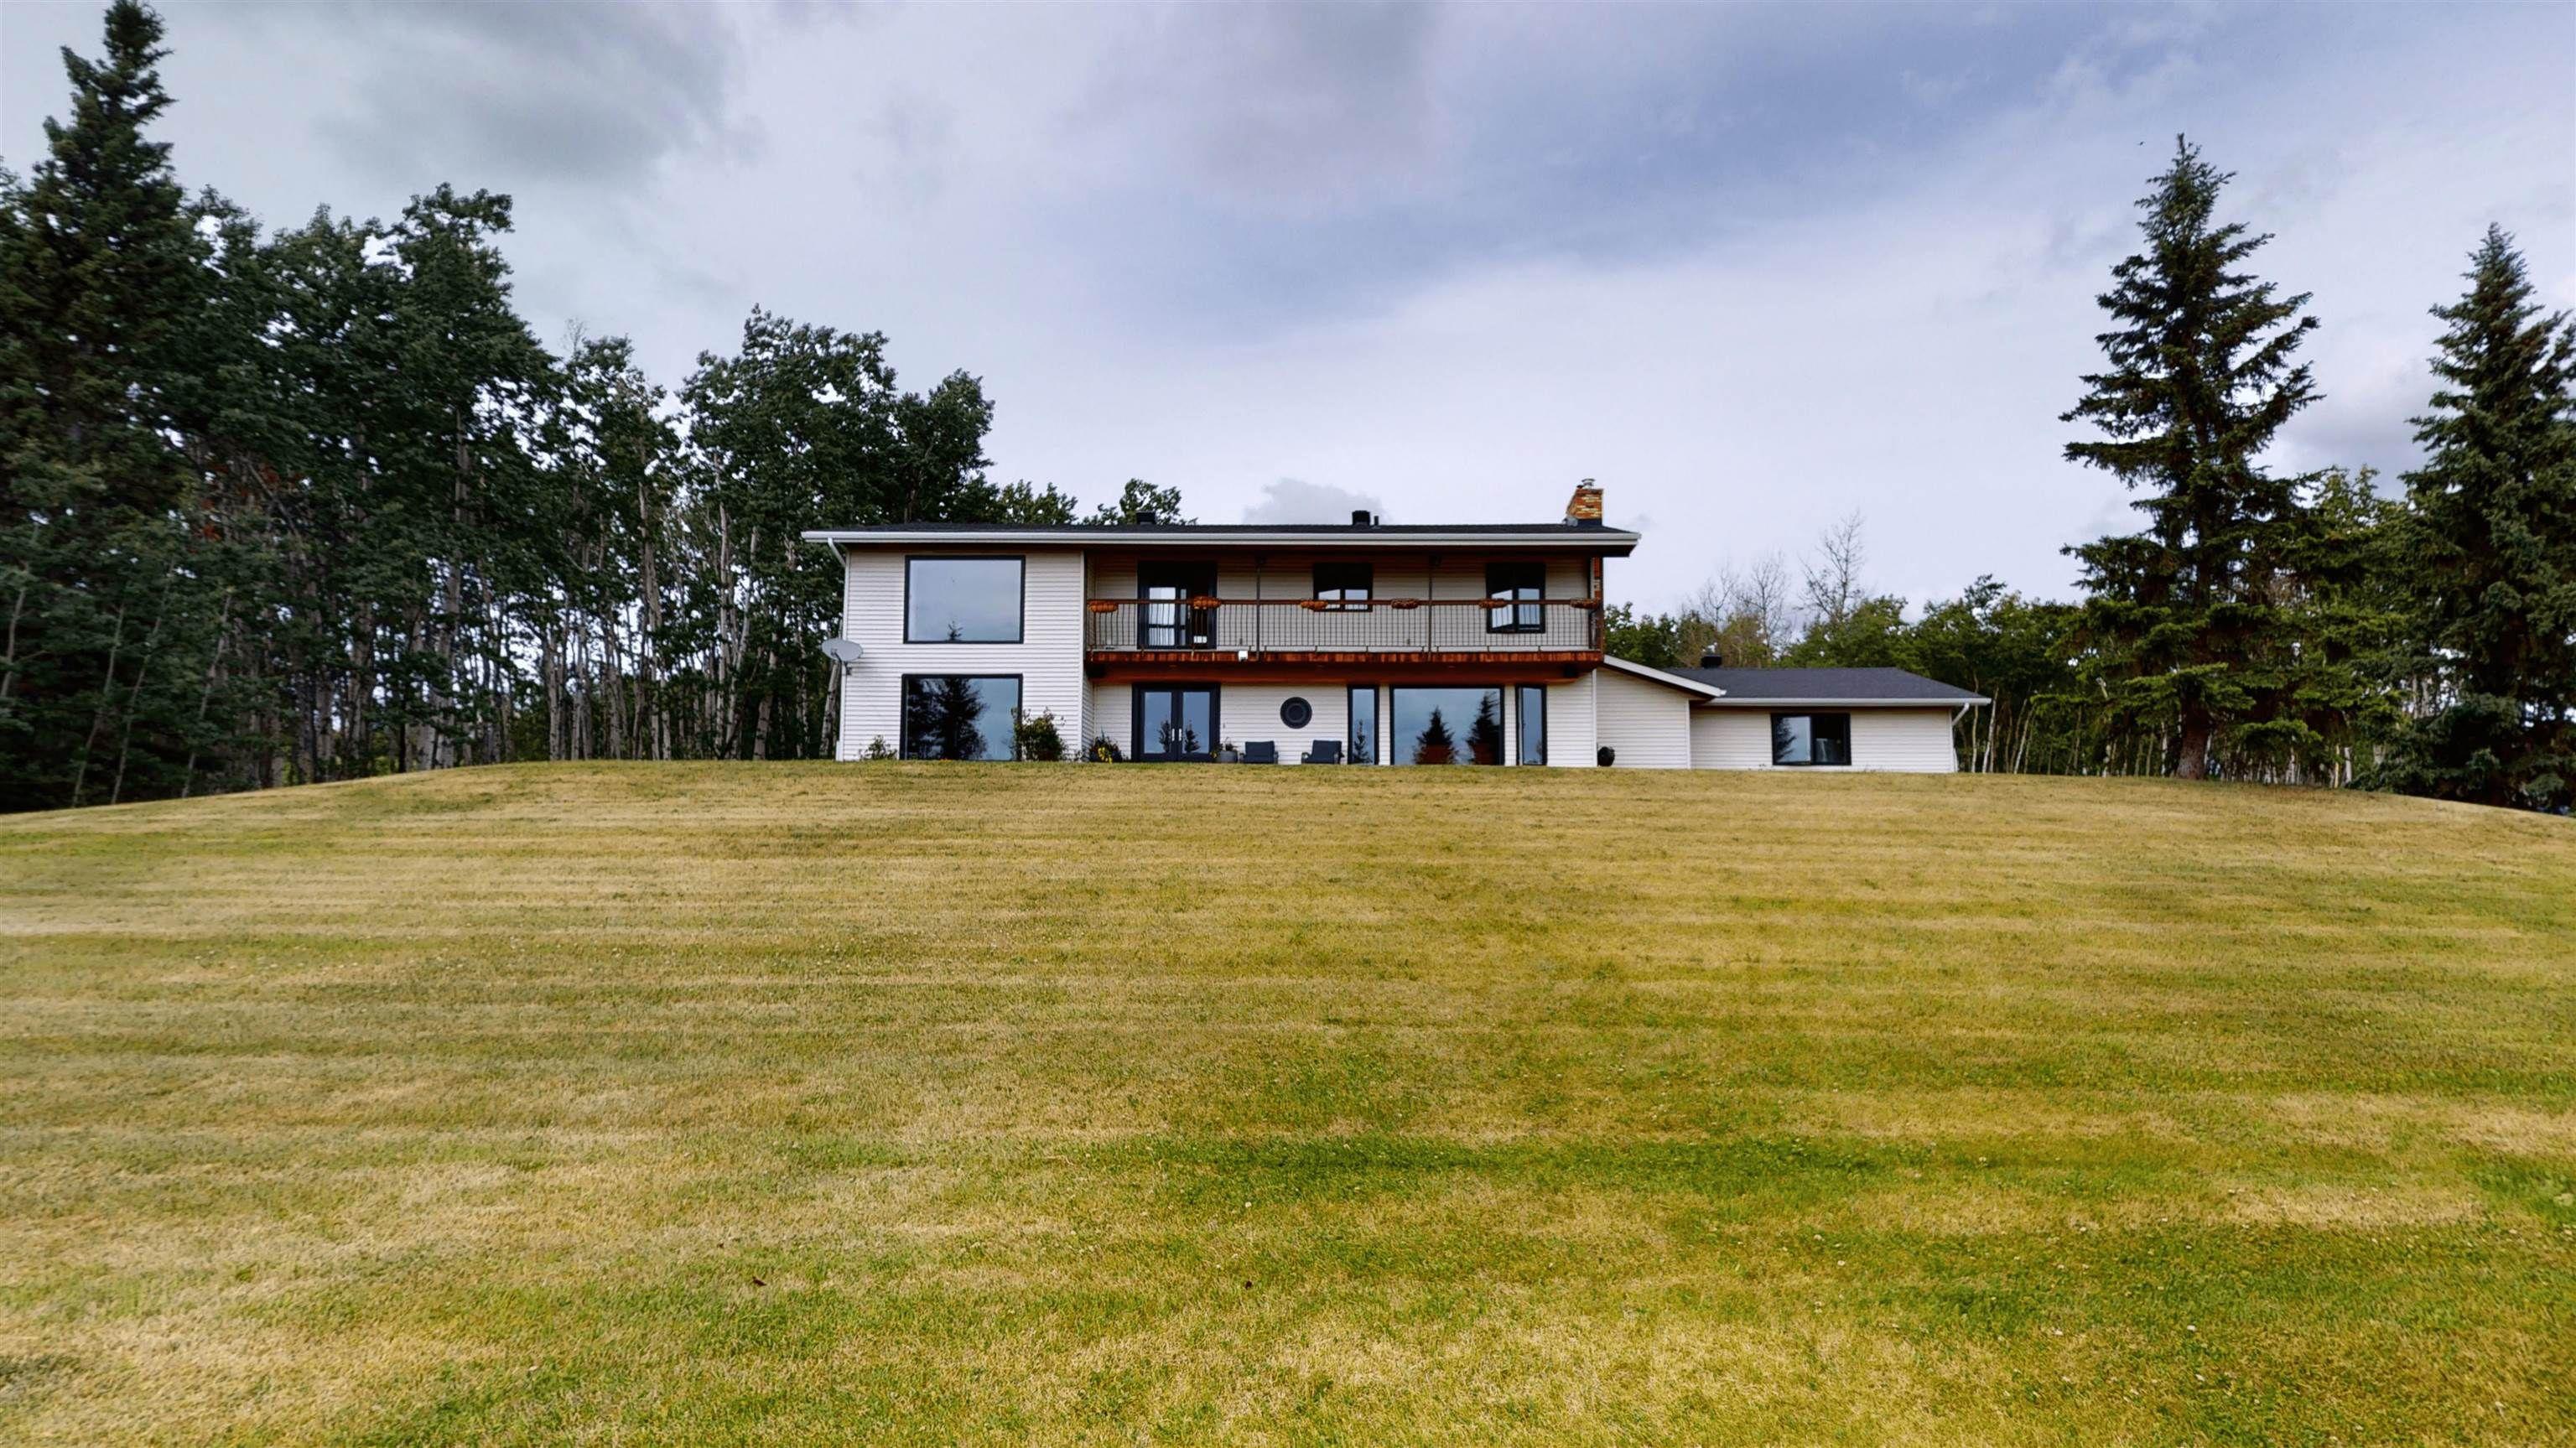 Main Photo: 12583 267 Road in Fort St. John: Fort St. John - Rural W 100th House for sale (Fort St. John (Zone 60))  : MLS®# R2621428